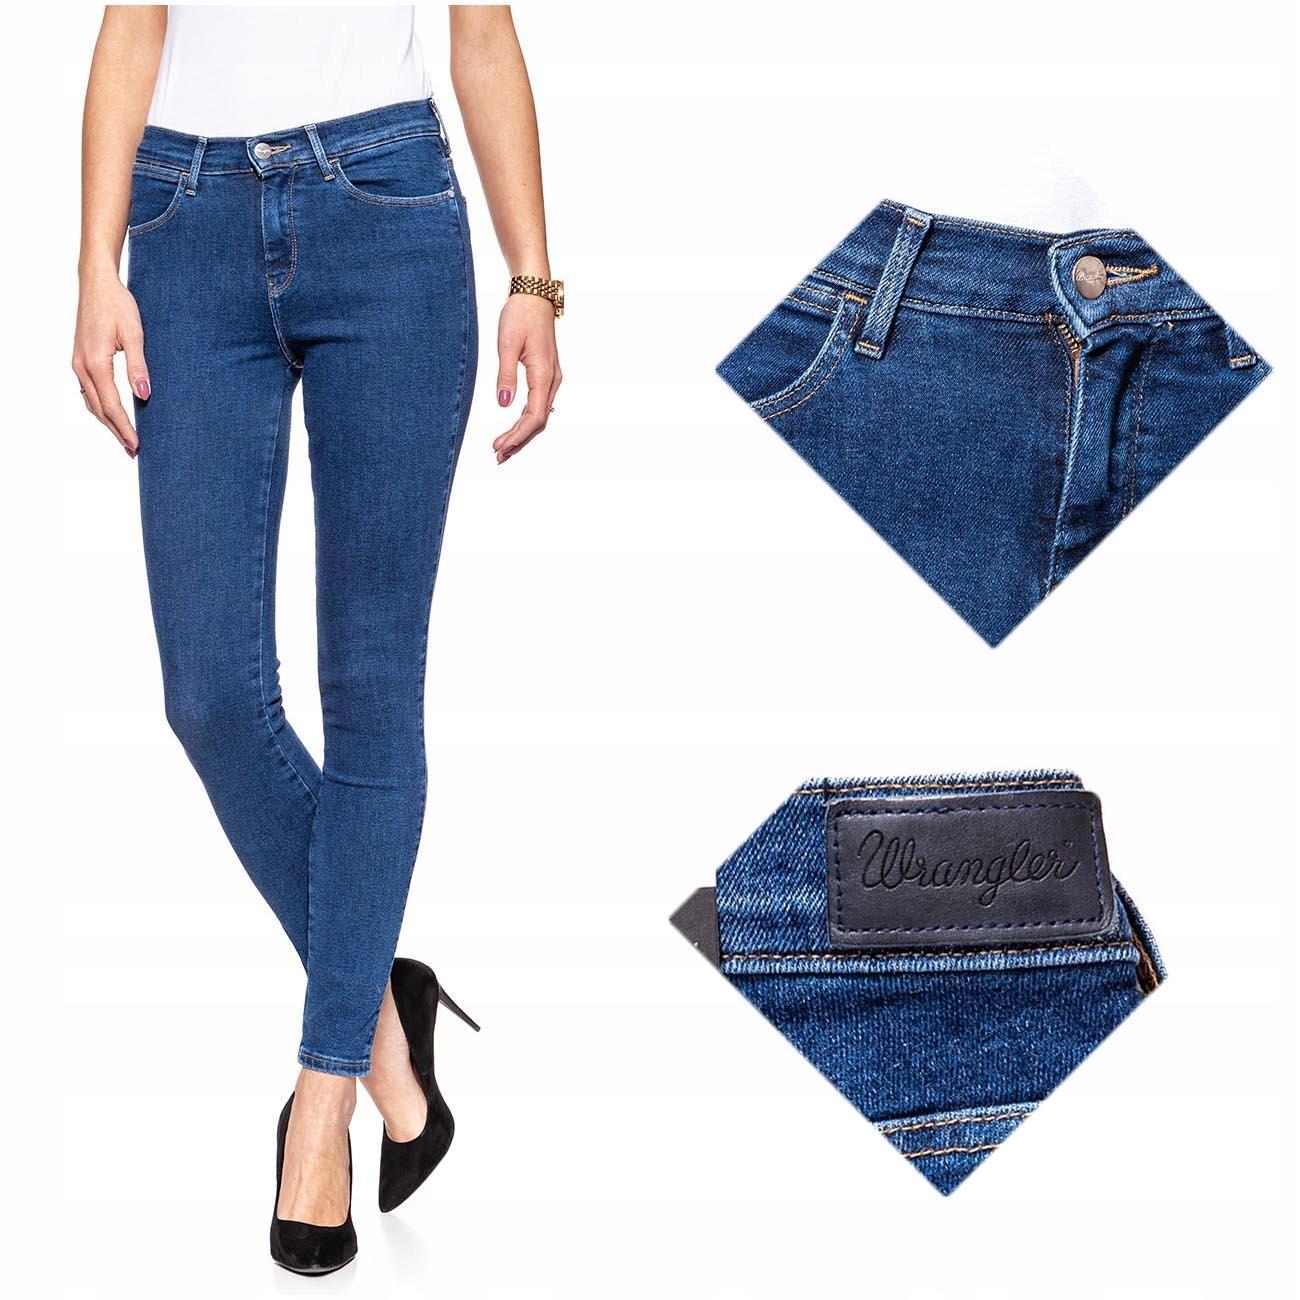 Wrangler High Skinny Spodnie Damskie Jeans W24 L32